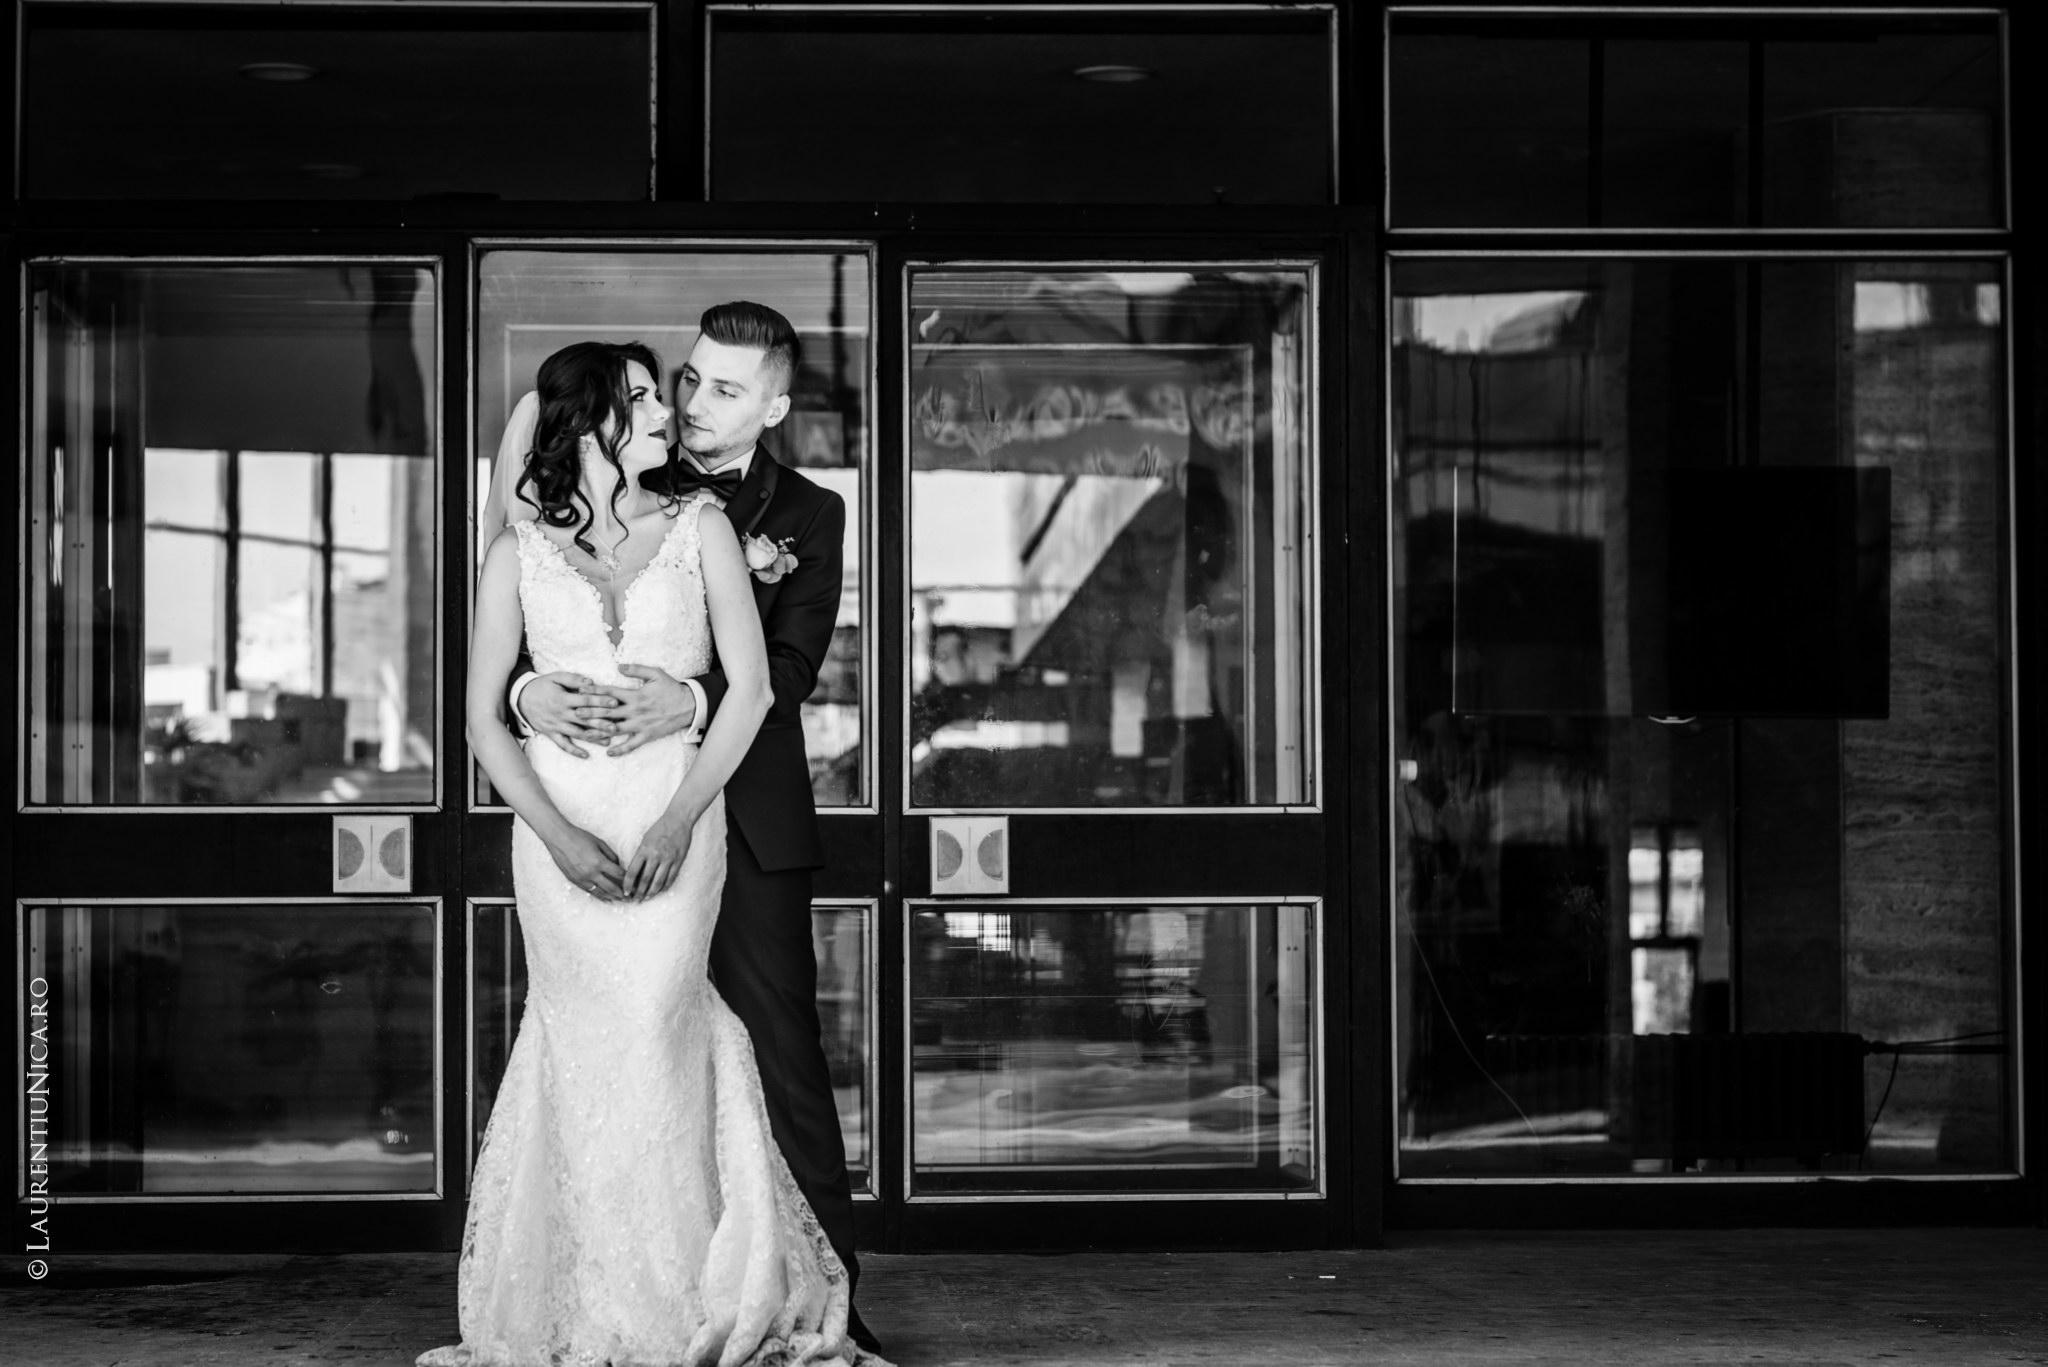 fotografii nunta craiova bia alex fotograf nunta laurentiu nica 30 - Bia & Alex | Fotografii nunta | Craiova